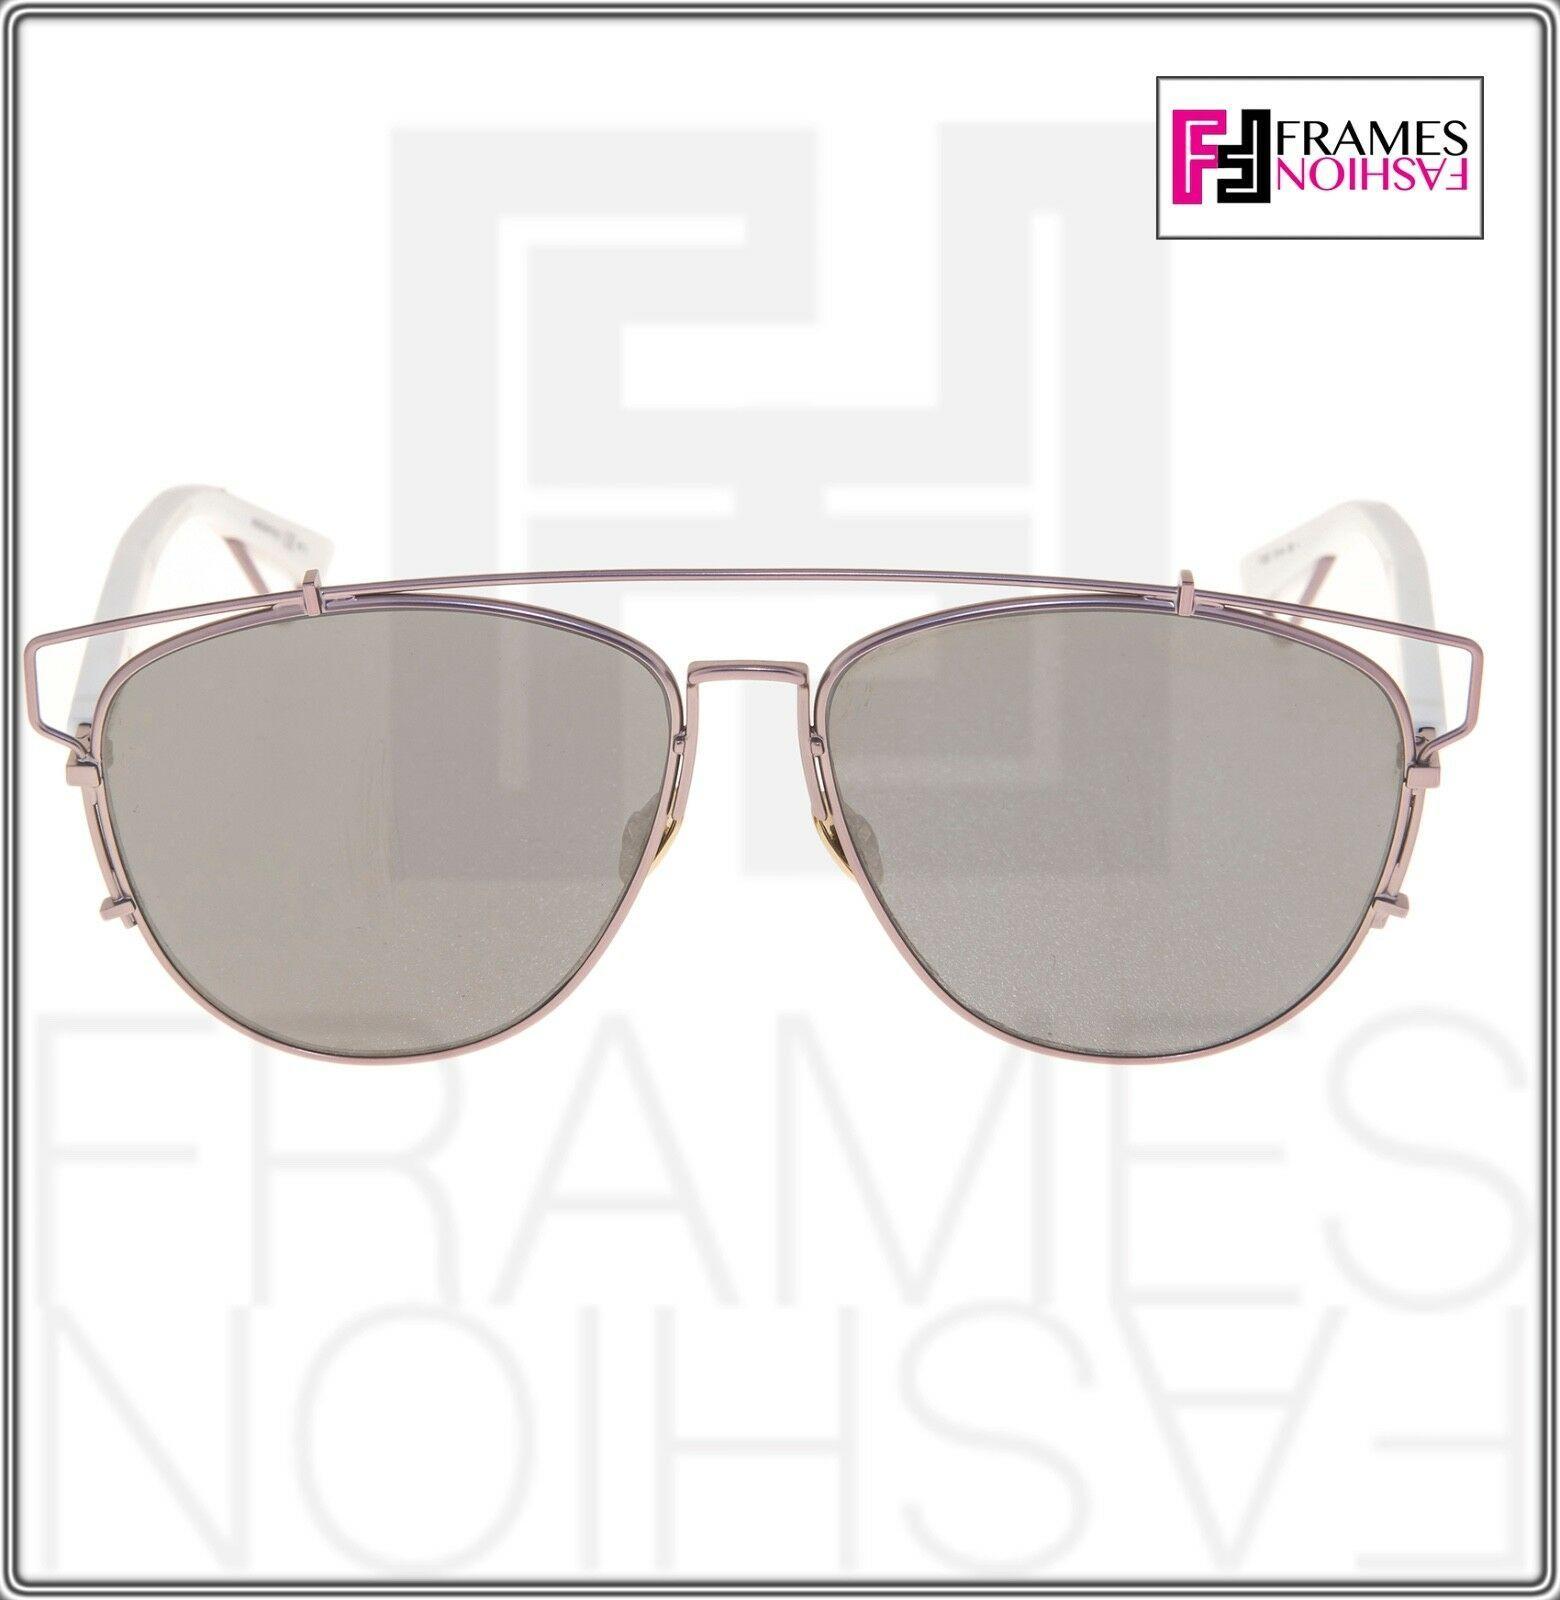 CHRISTIAN DIOR TECHNOLOGIC White Lilac Flash Mirrored Sunglasses DIORTECHNOLOGIC image 6